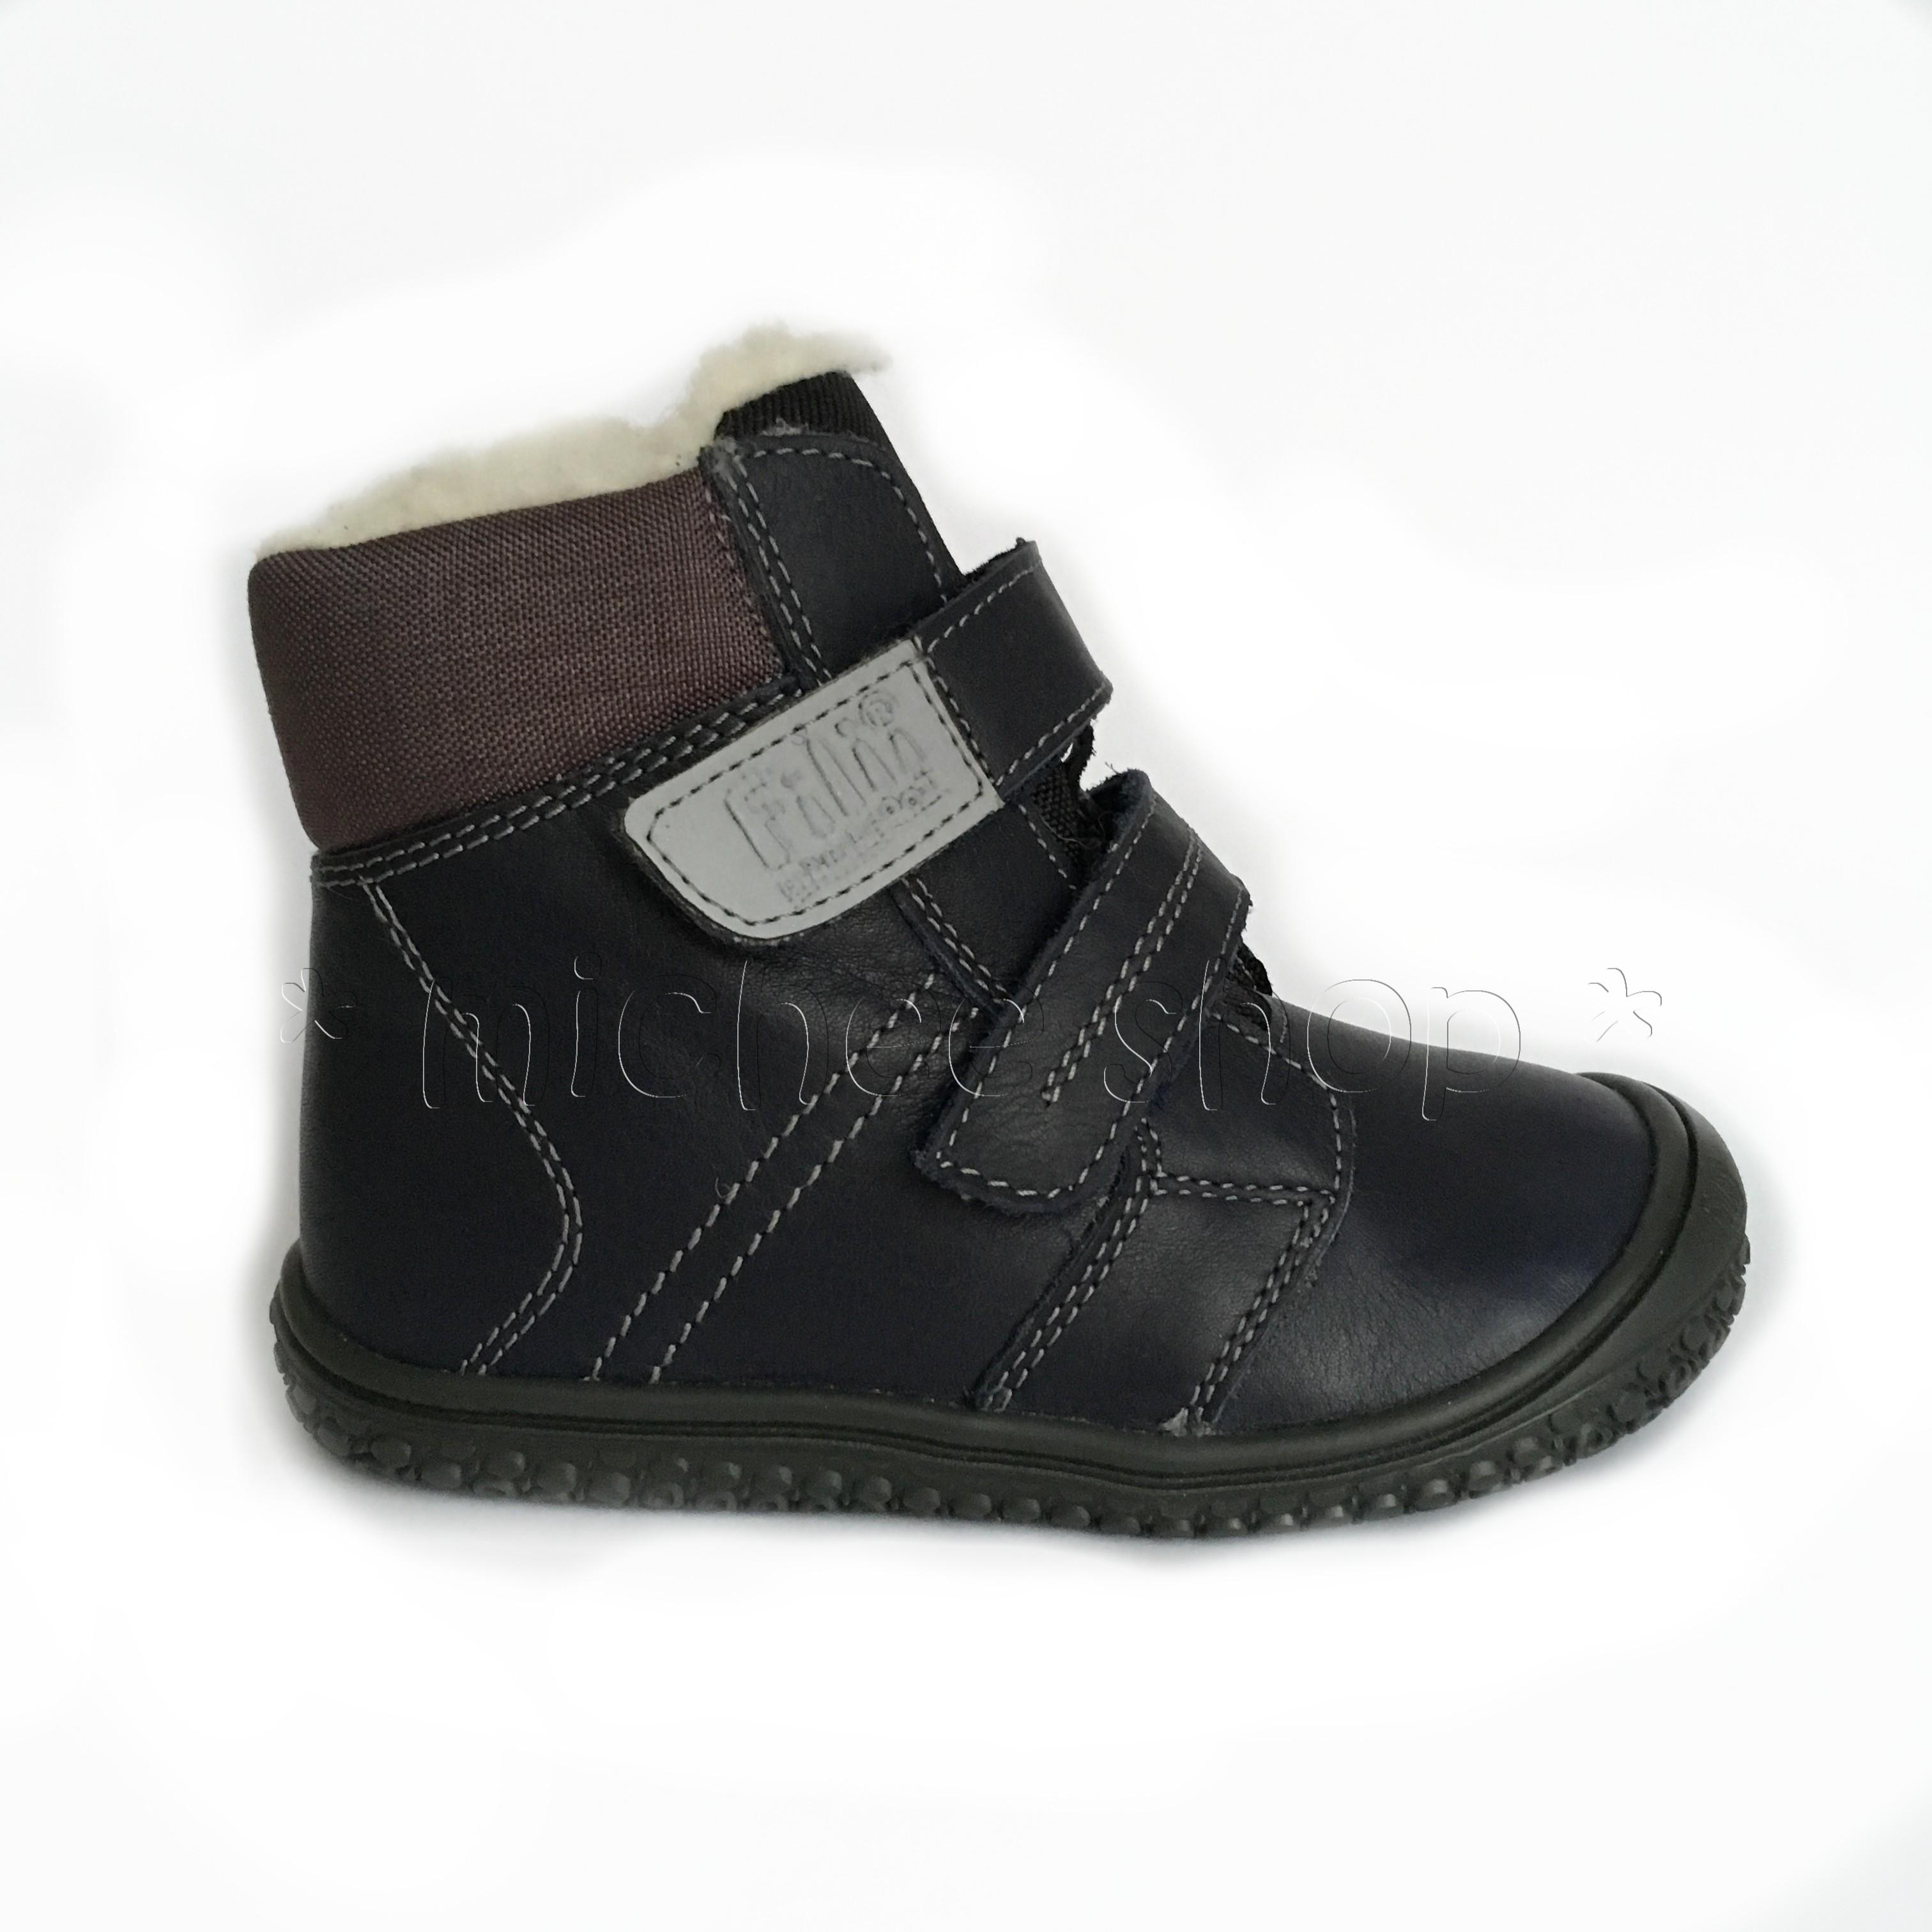 3840c0531b9 Zimní obuv | Zimní Filii Barefoot Himalaya Nappa Tex Wool Ocean 25 ...